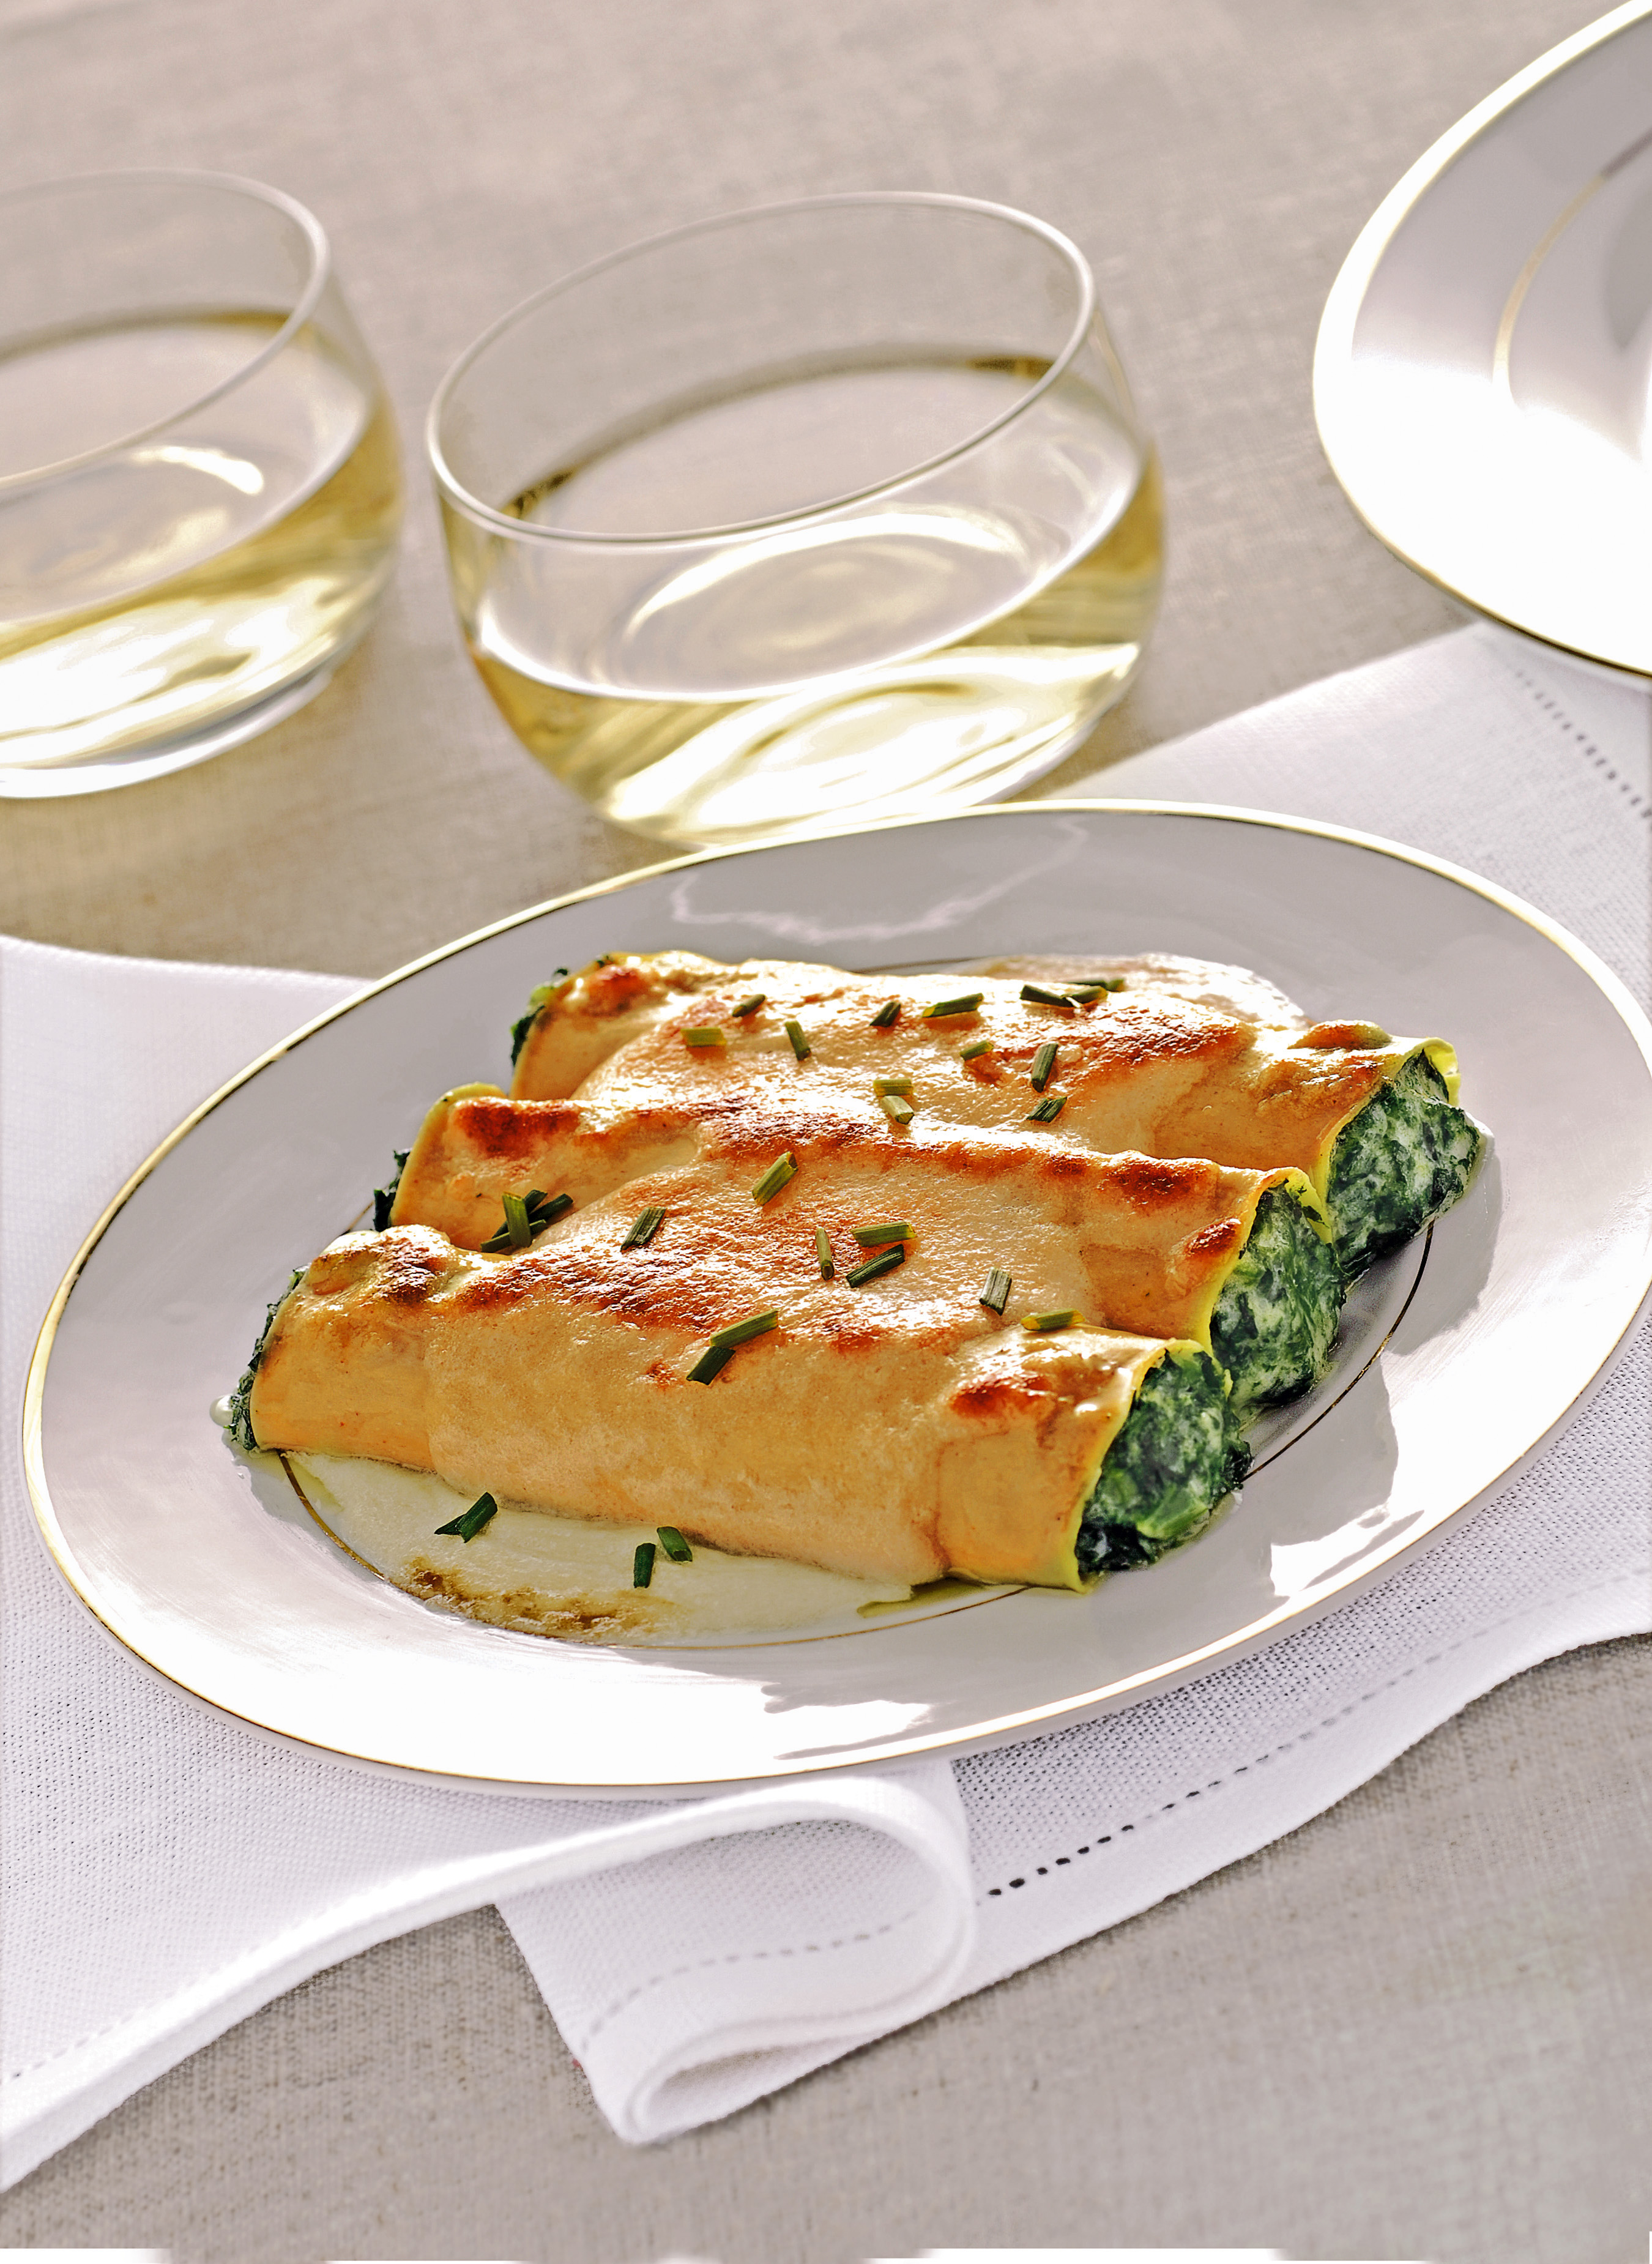 Gnudi ricotta e spinaci, ricetta toscana - Vittoria ai ...